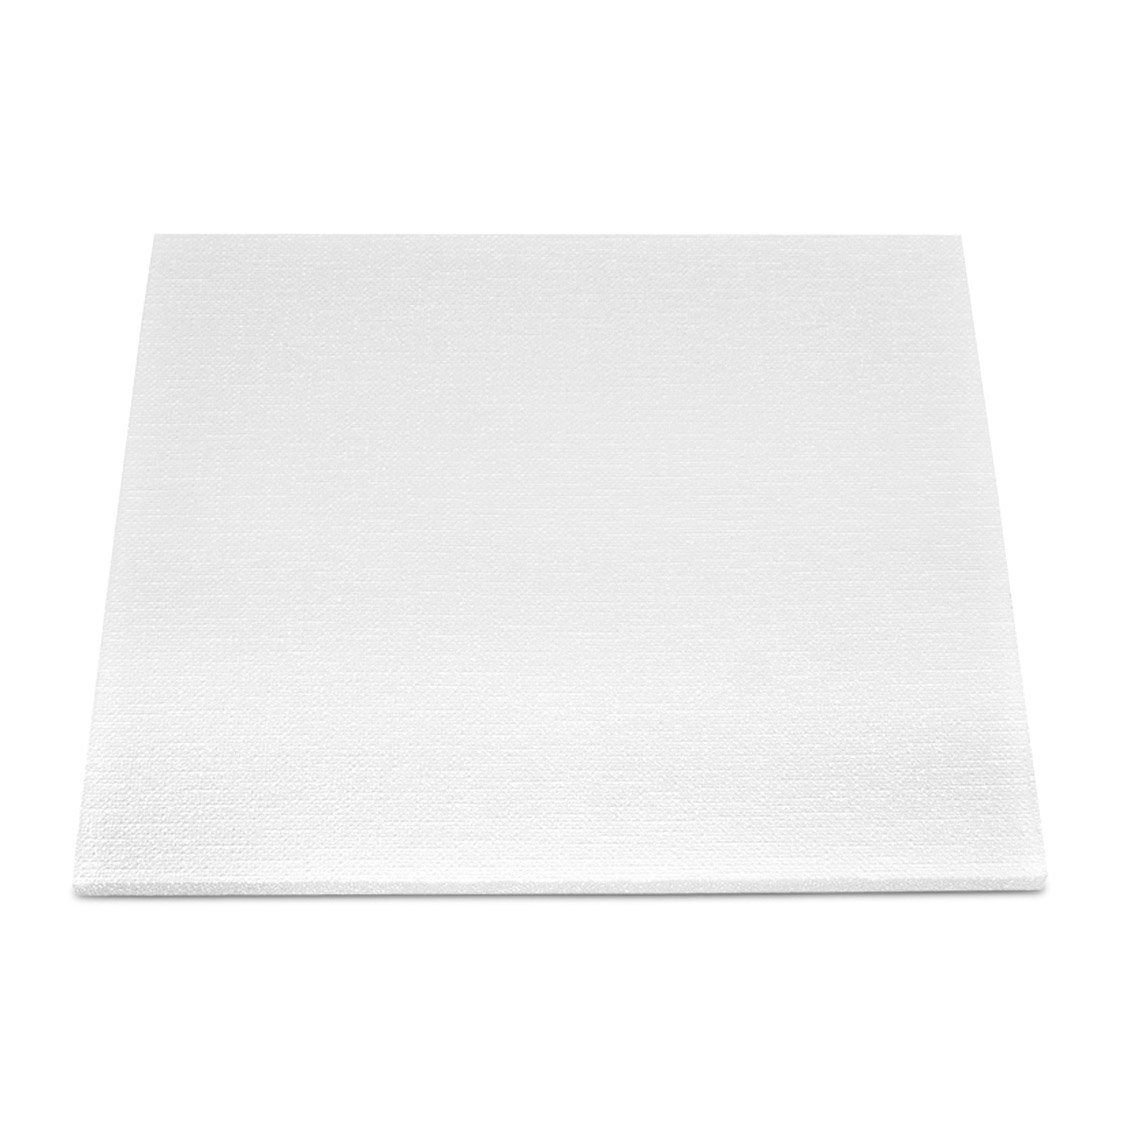 Dalle polystyrene plafond castorama - chaton chien à donner